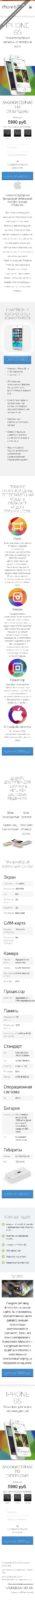 Скриншот Готового лендинга Iphone 6s 002 - моб